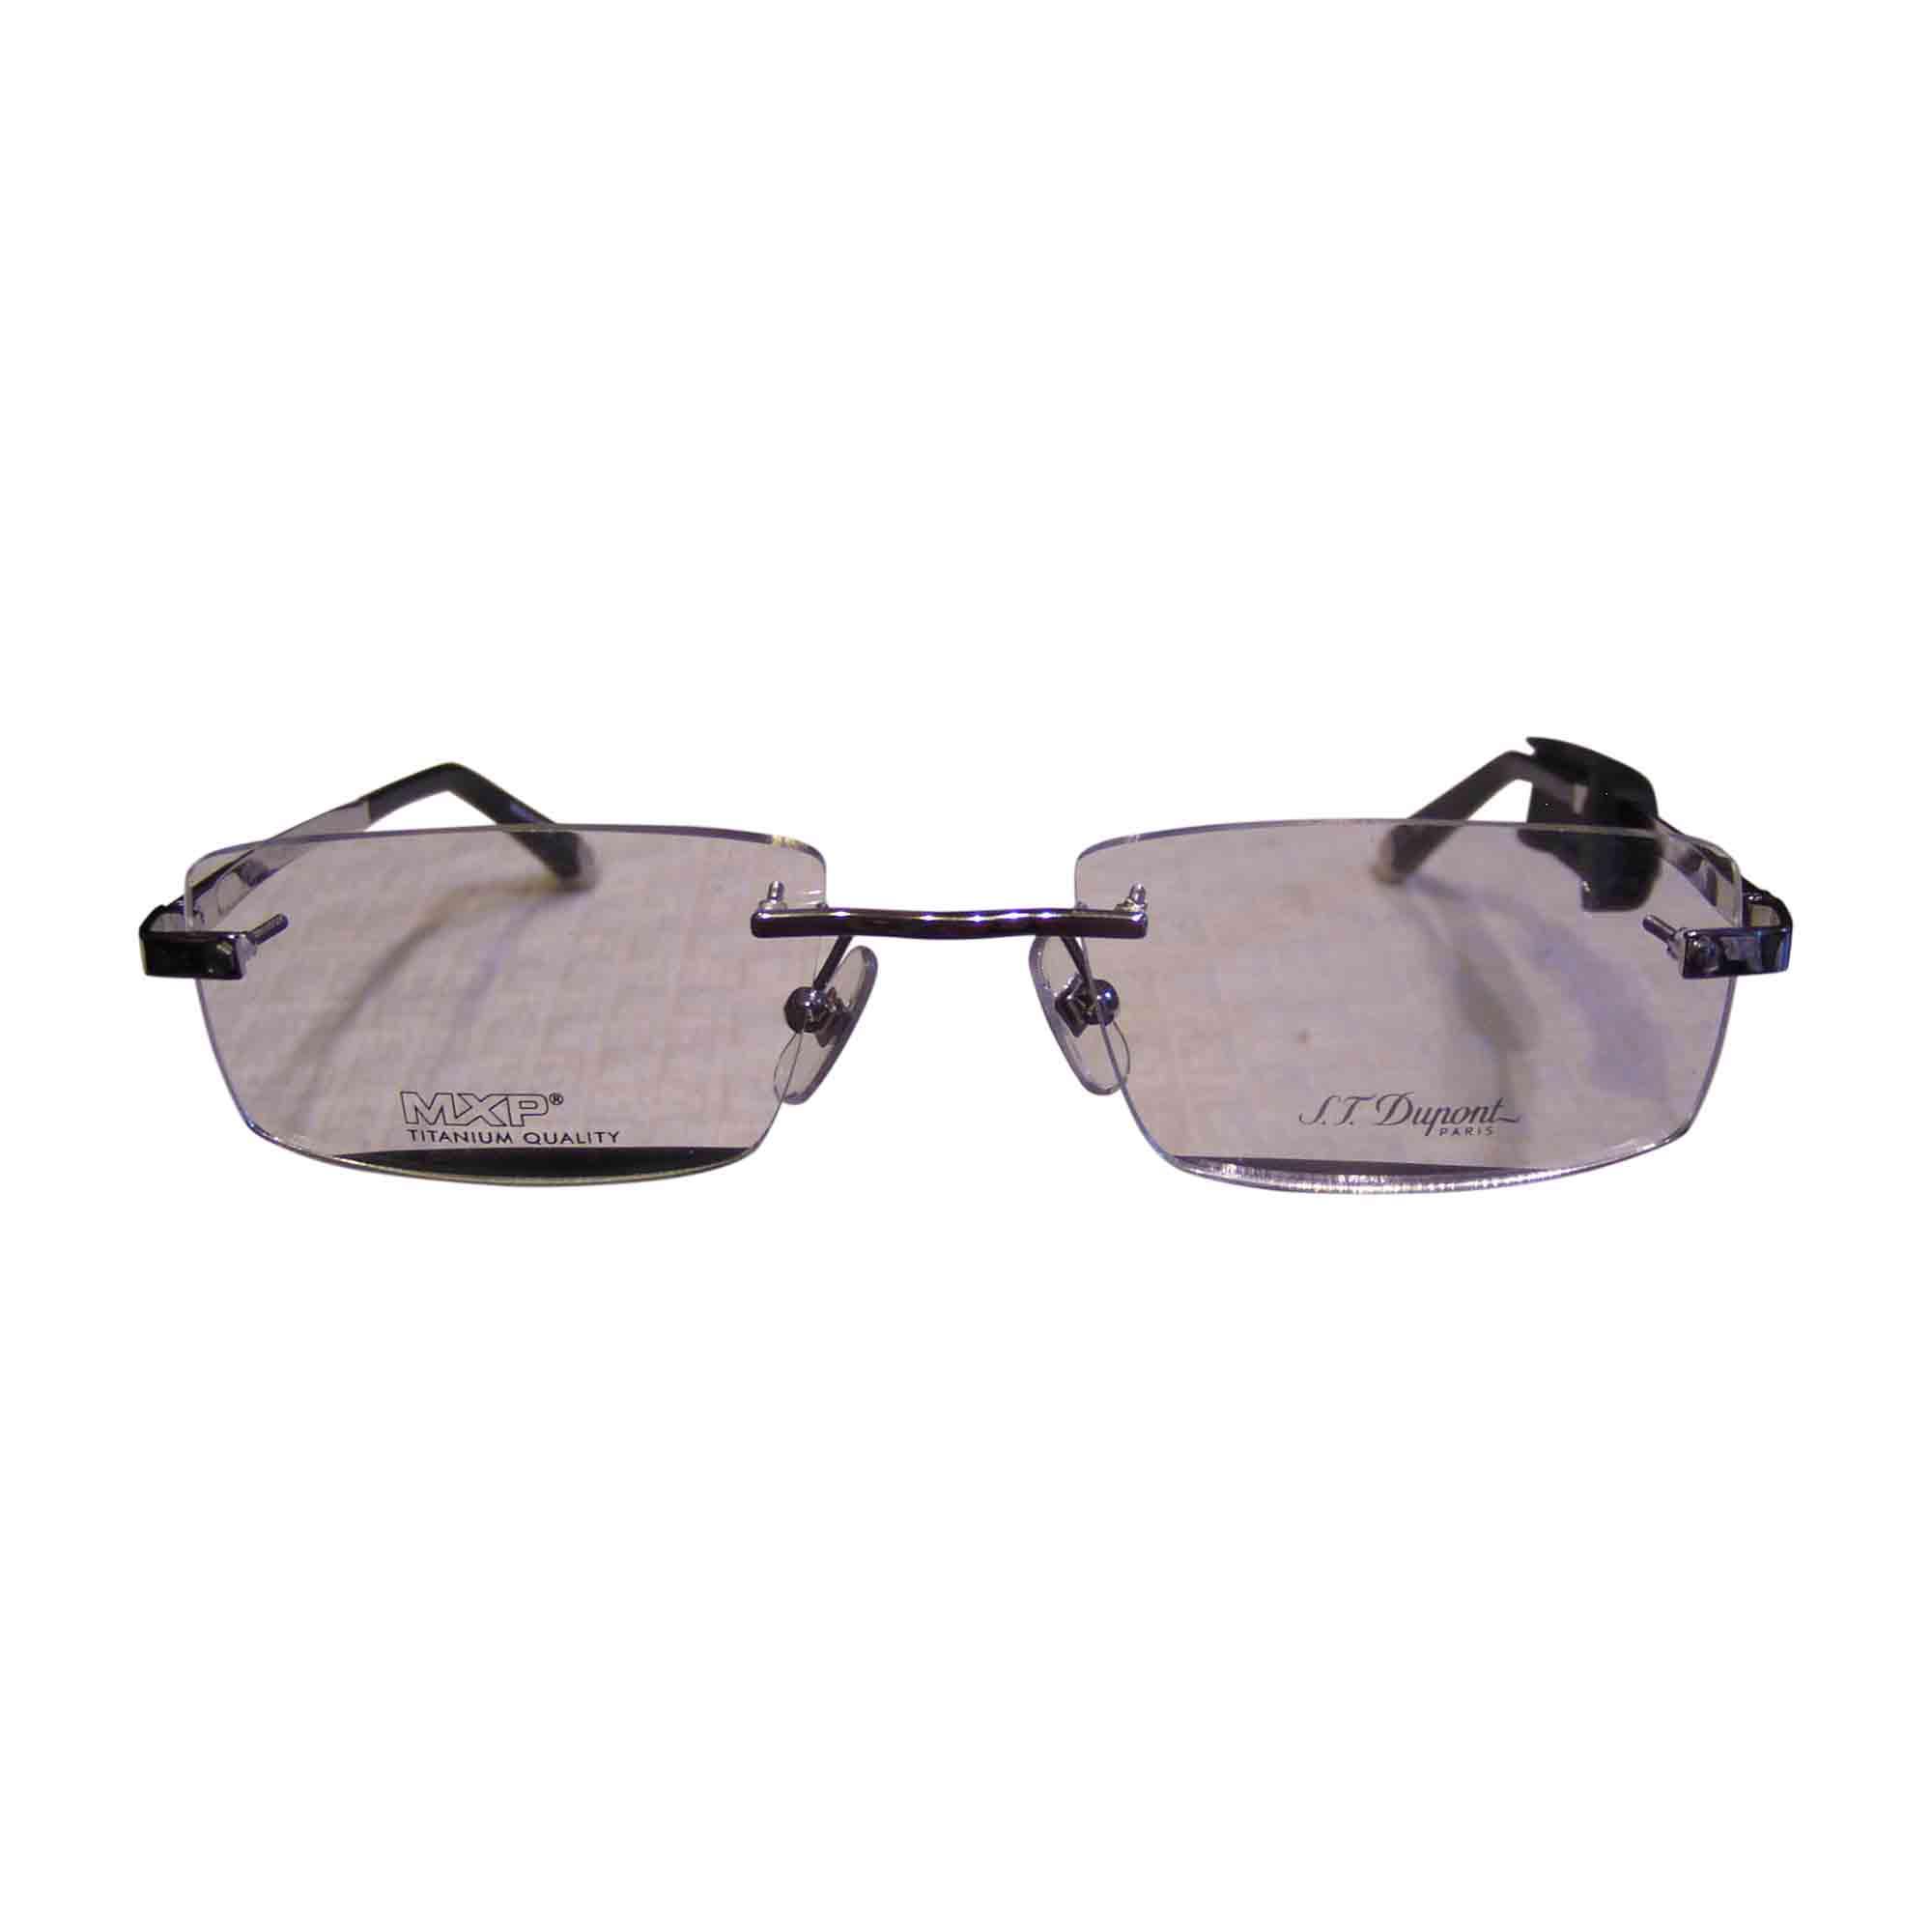 Eyeglass Frames ST DUPONT golden vendu par Corinne 2616 - 6330219